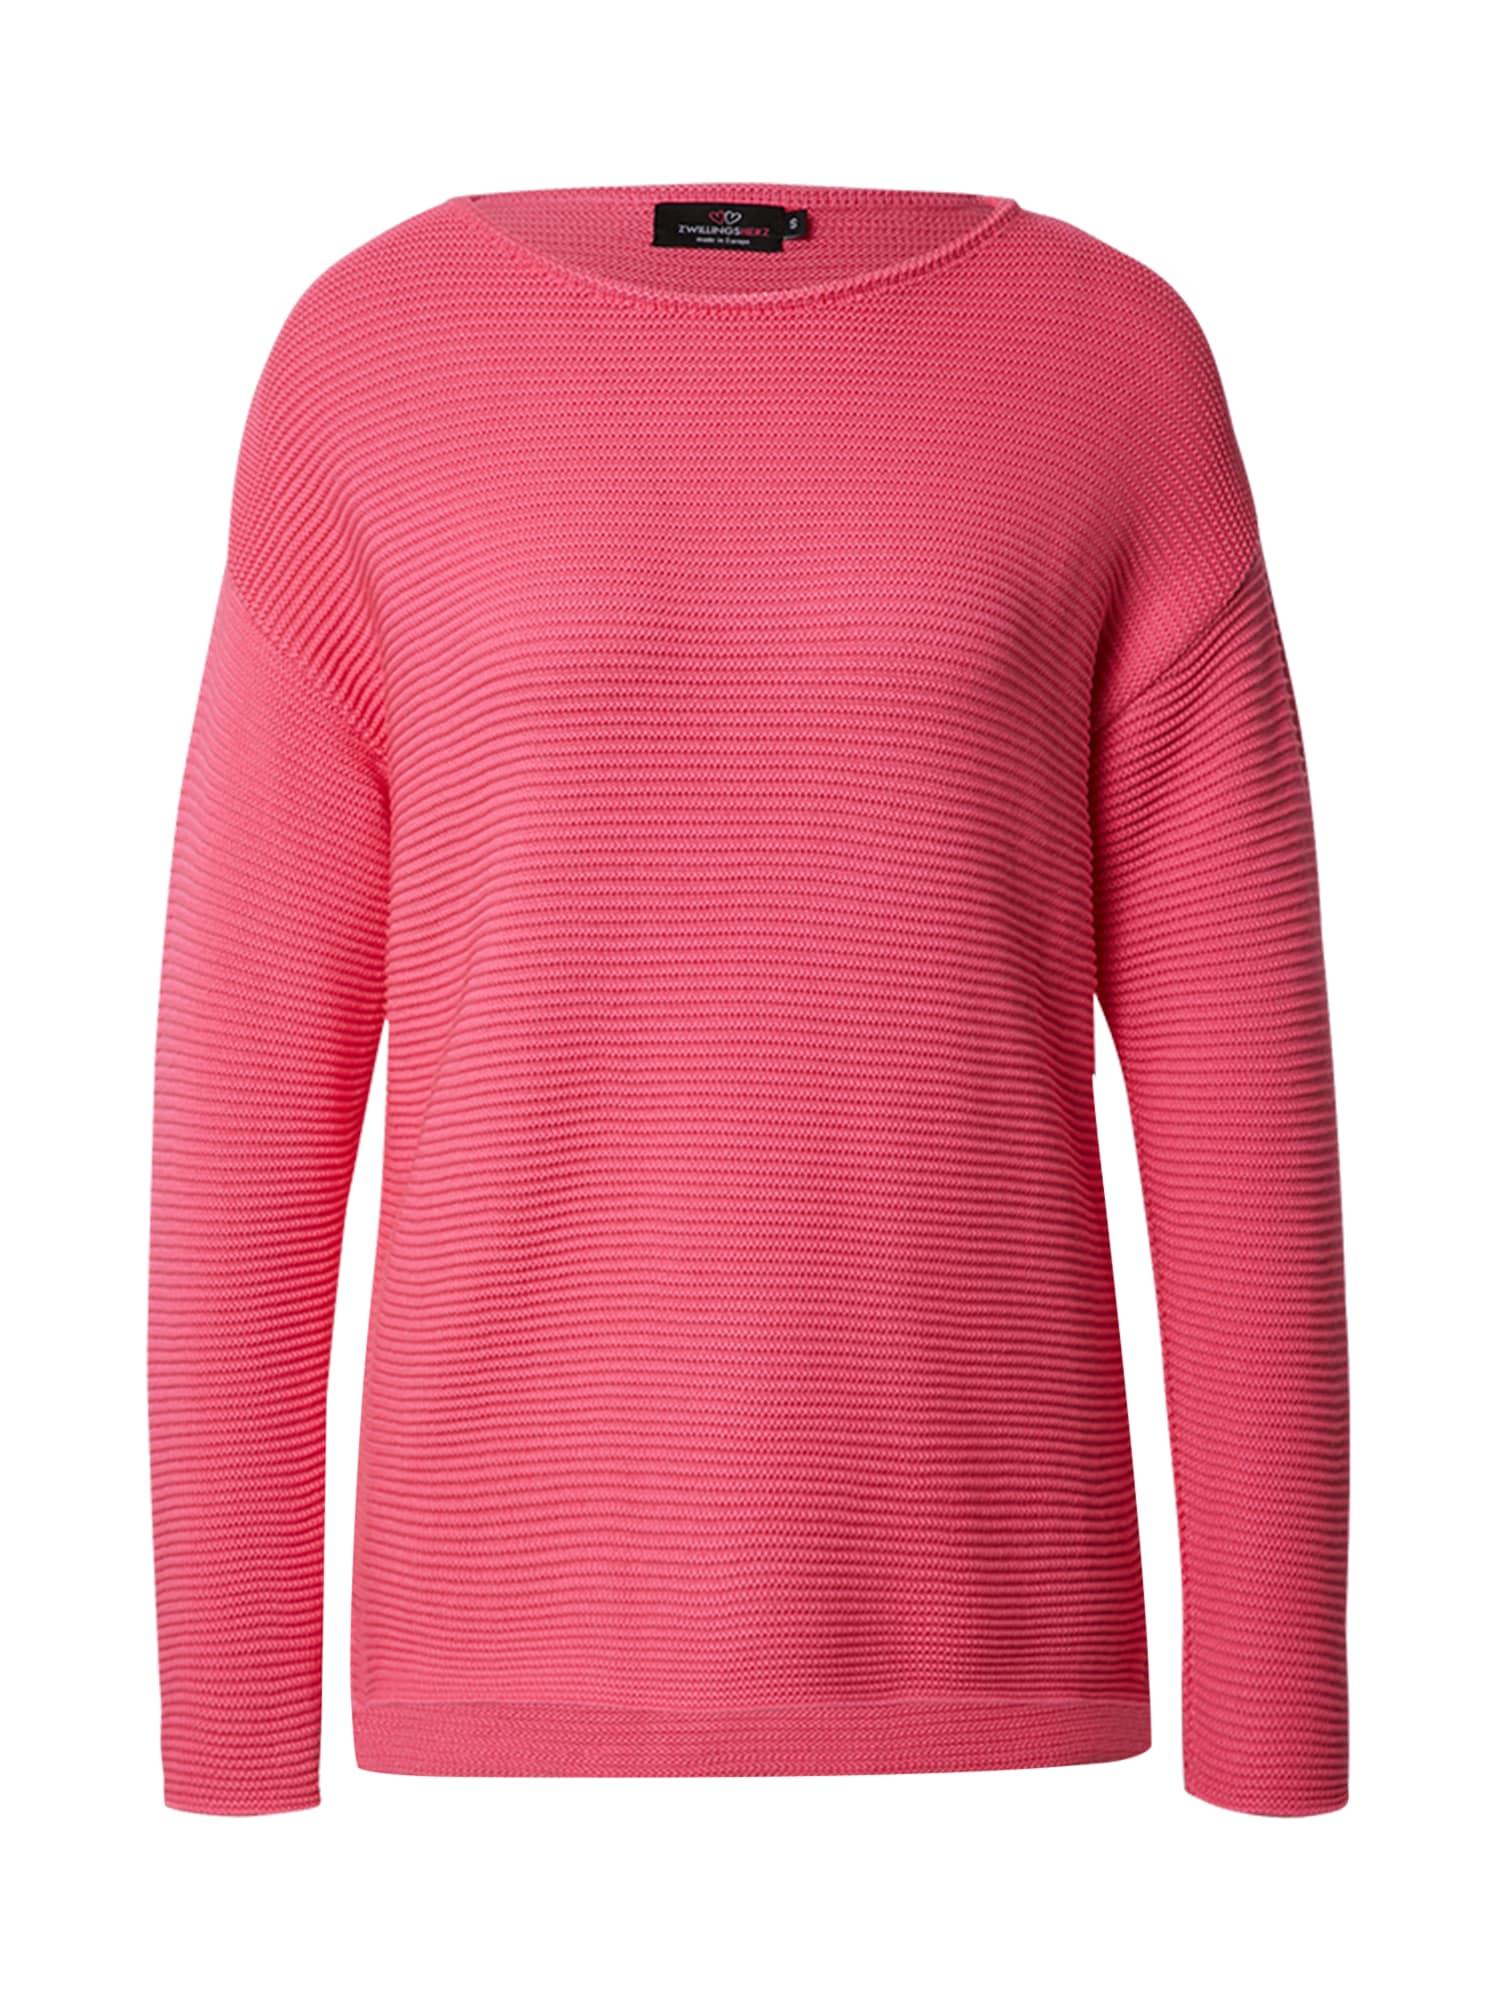 Zwillingsherz Megztinis pitajų spalva